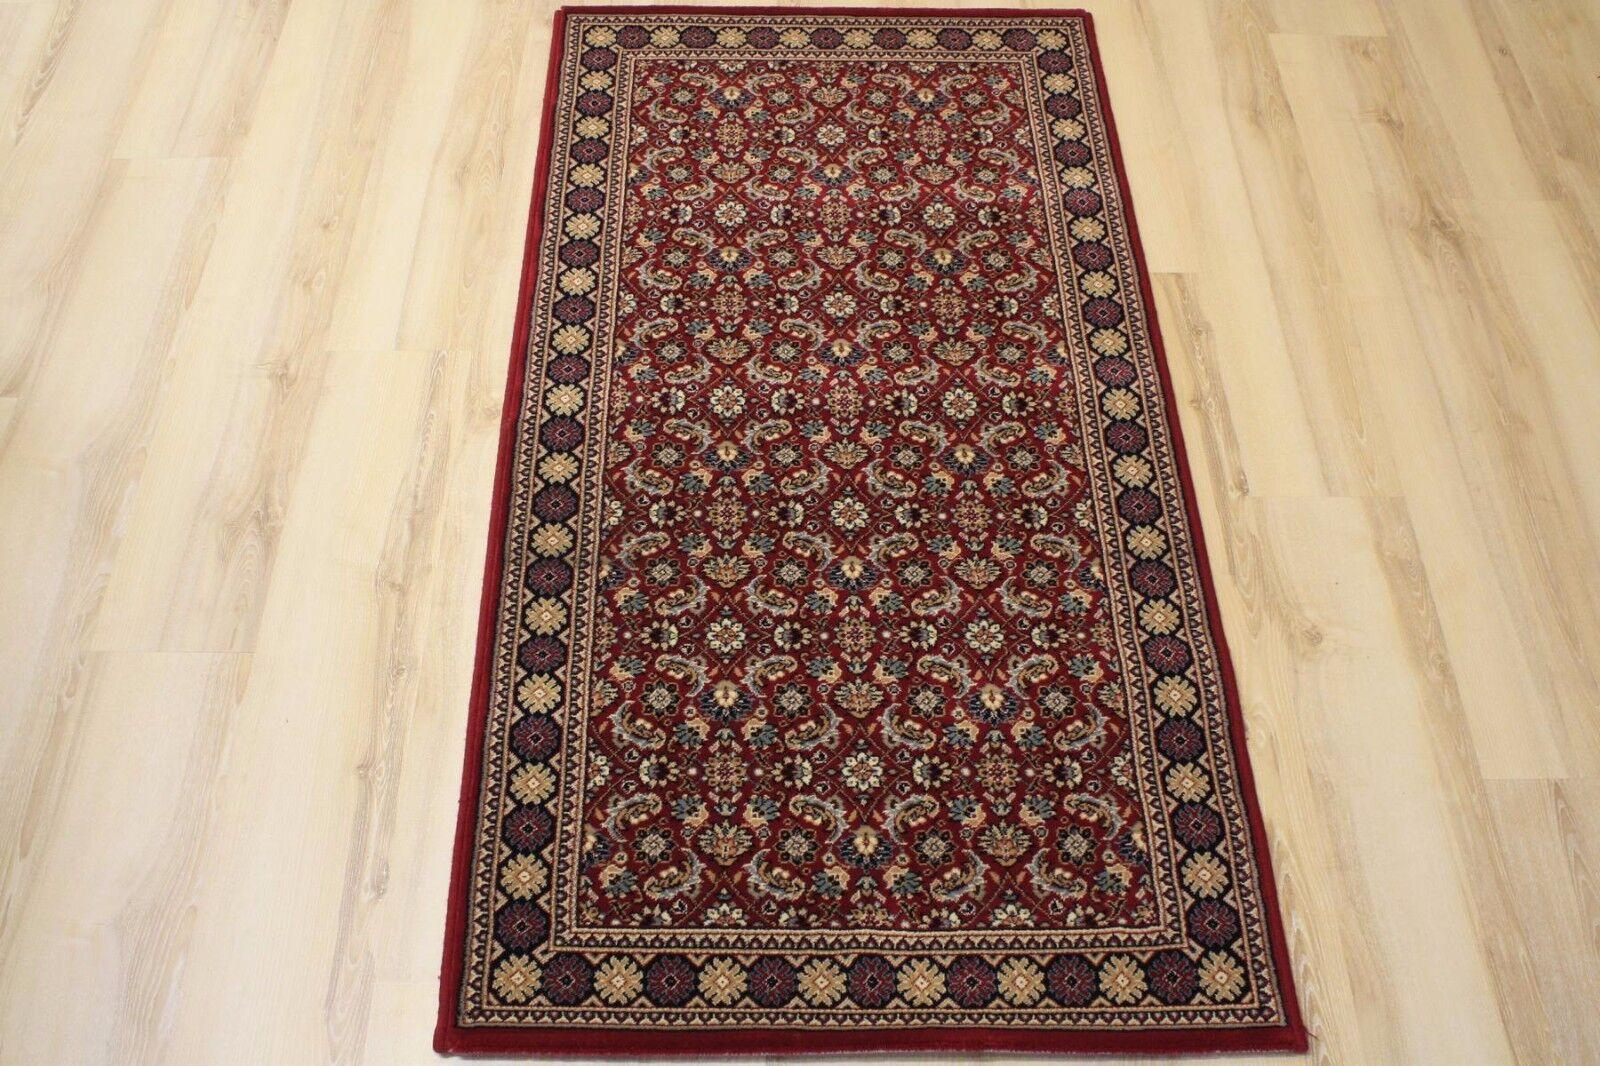 Lano alfombra kasbah 12176 474 Orient 240x340 cm clásico